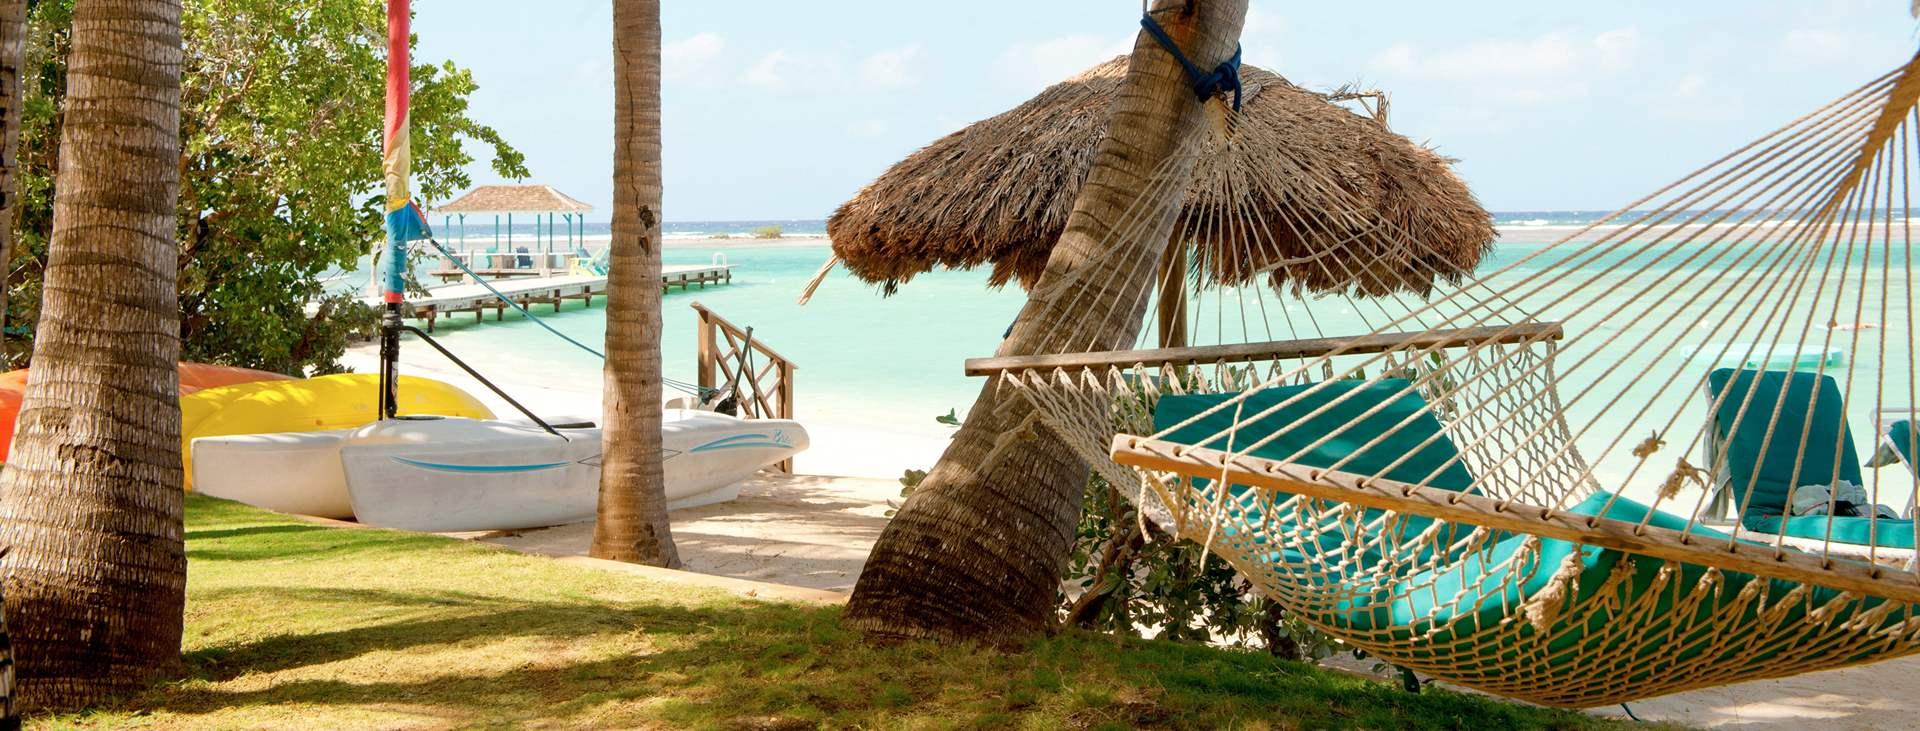 Boka din resa till Montego Bay på Jamaica med Ving